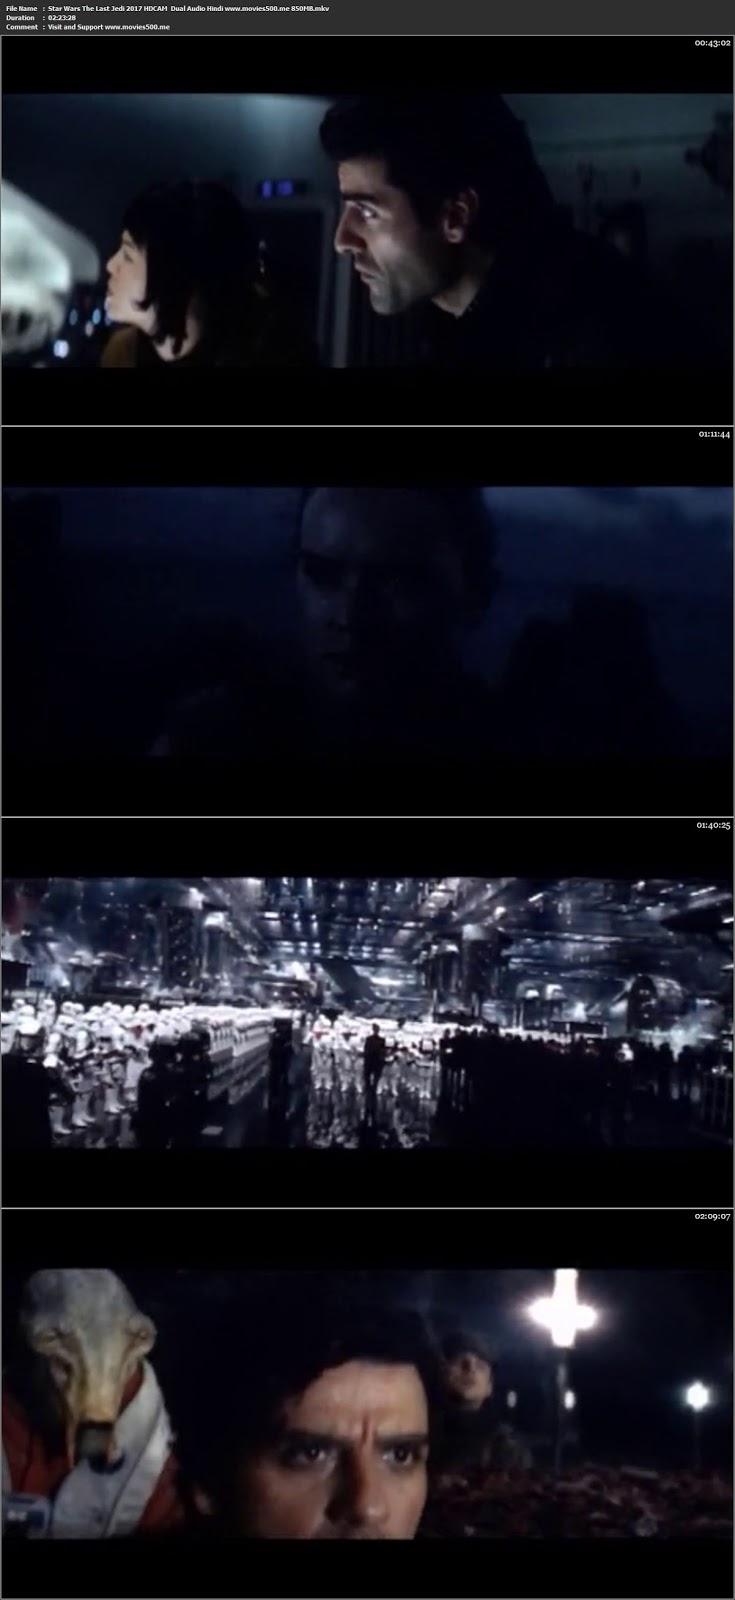 Star Wars The Last Jedi 2017 Dual Audio Hindi HDCAM 720p at movies500.xyz